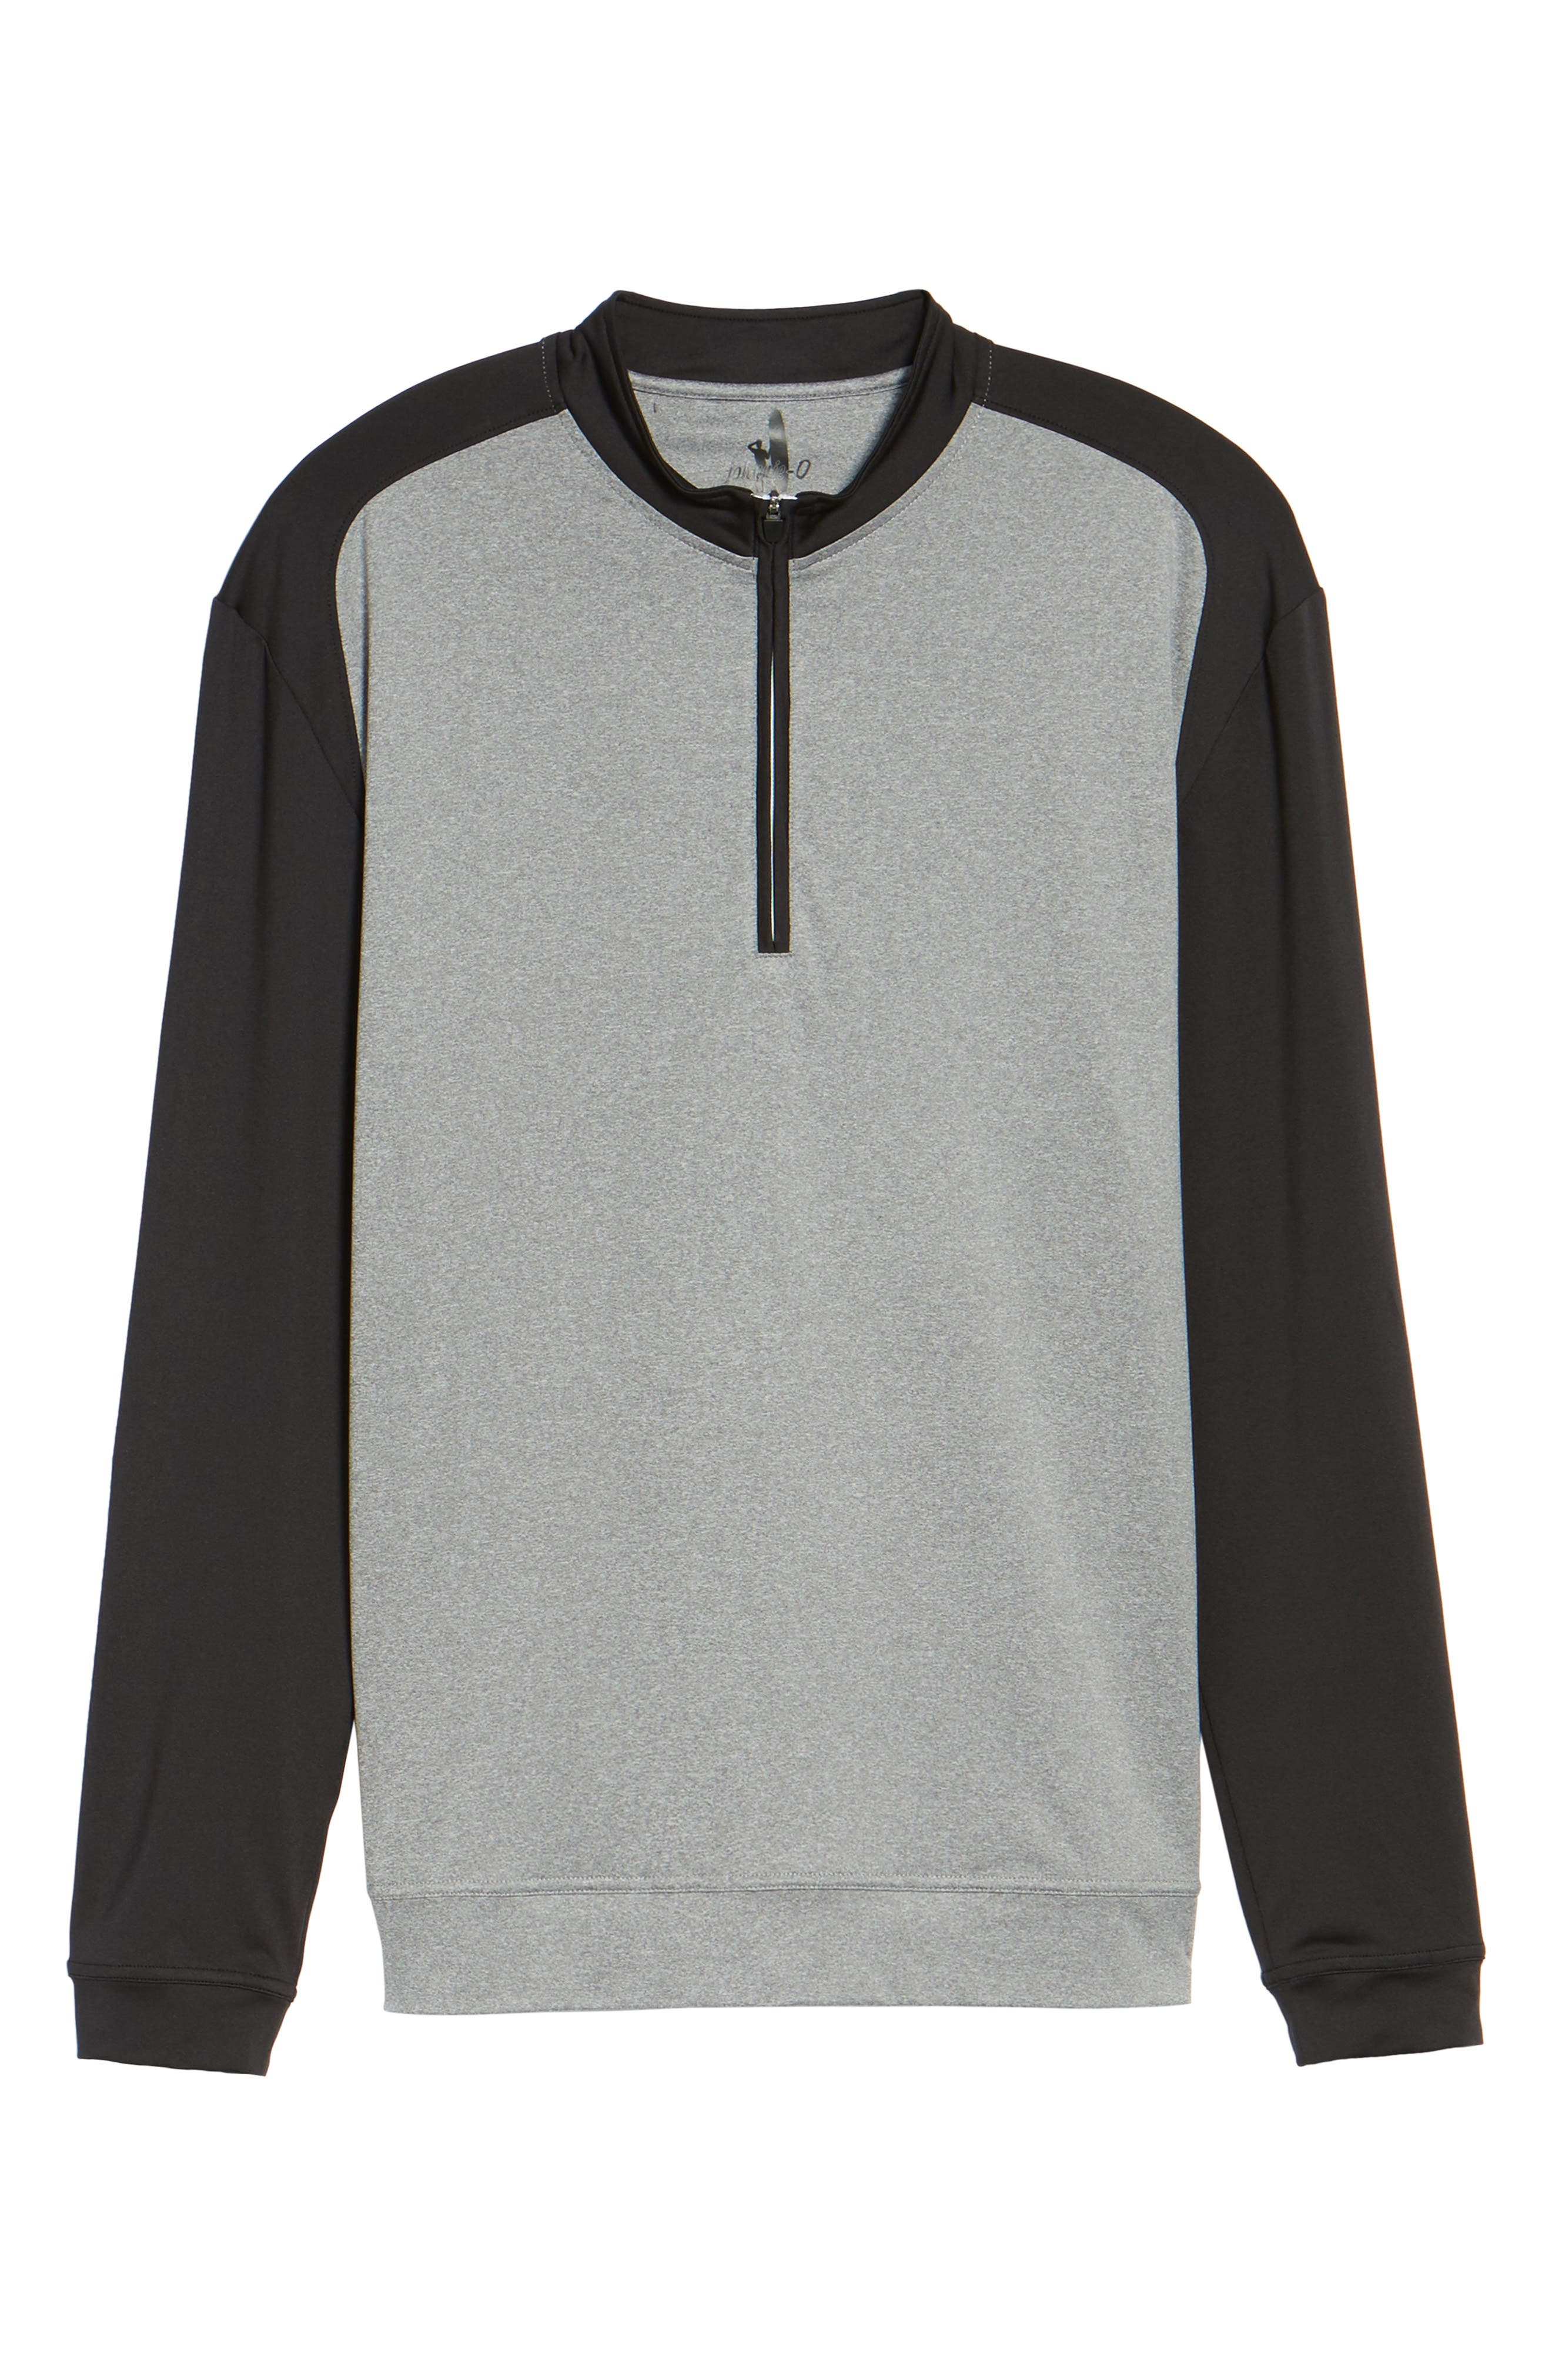 Sway Classic Fit Zip Raglan Pullover,                             Alternate thumbnail 6, color,                             Black